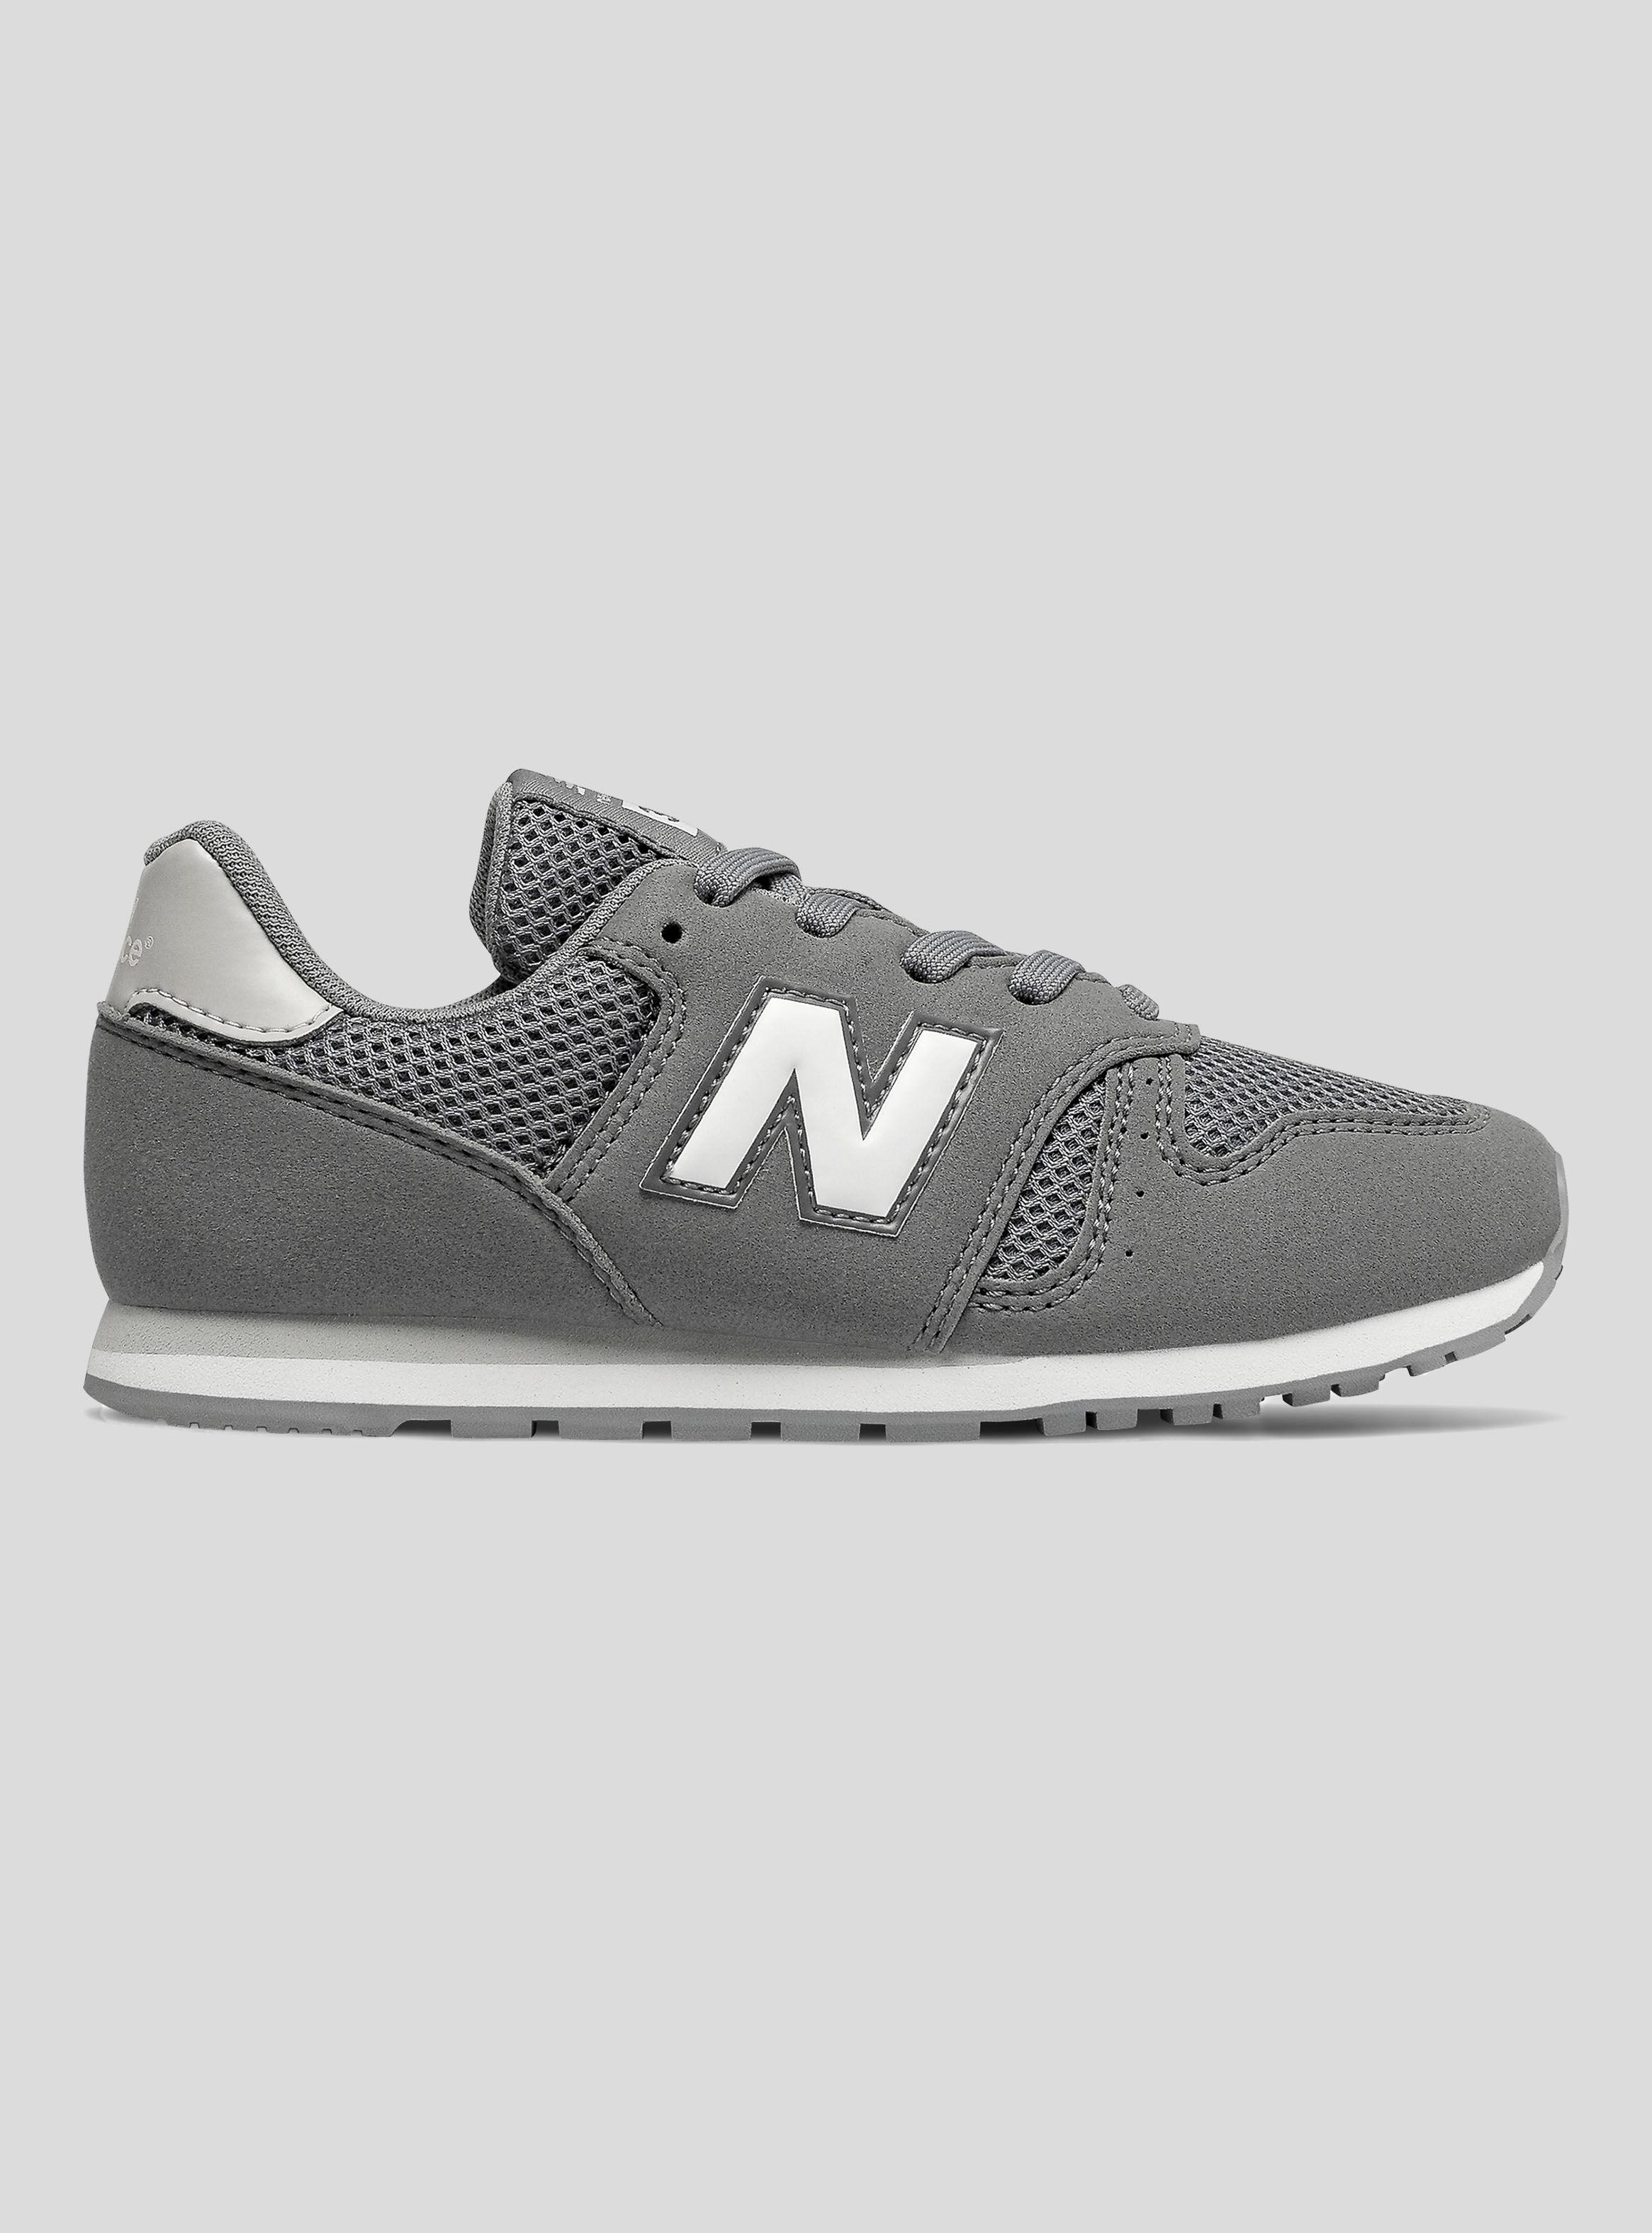 sapatillas new balance nino